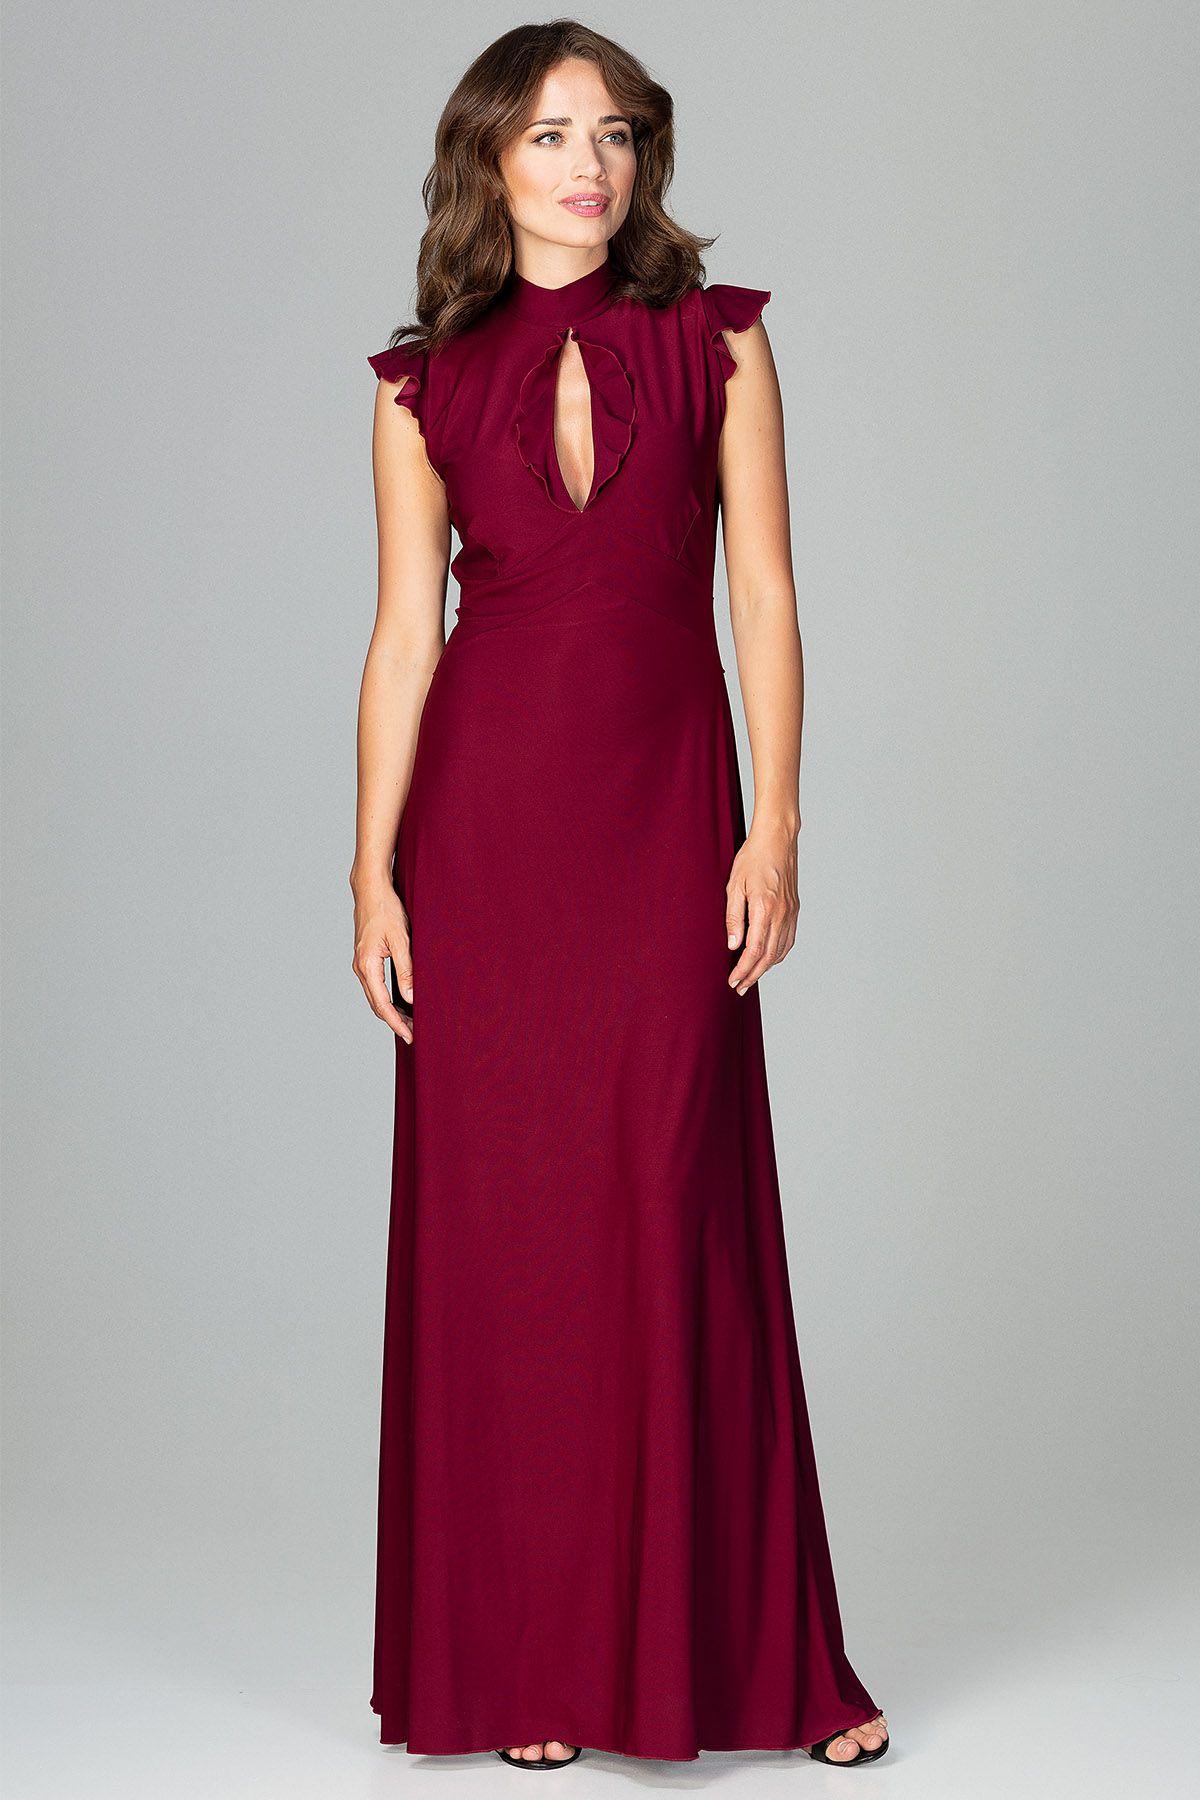 Maxi Dress With Teardrop-Shaped Neckline